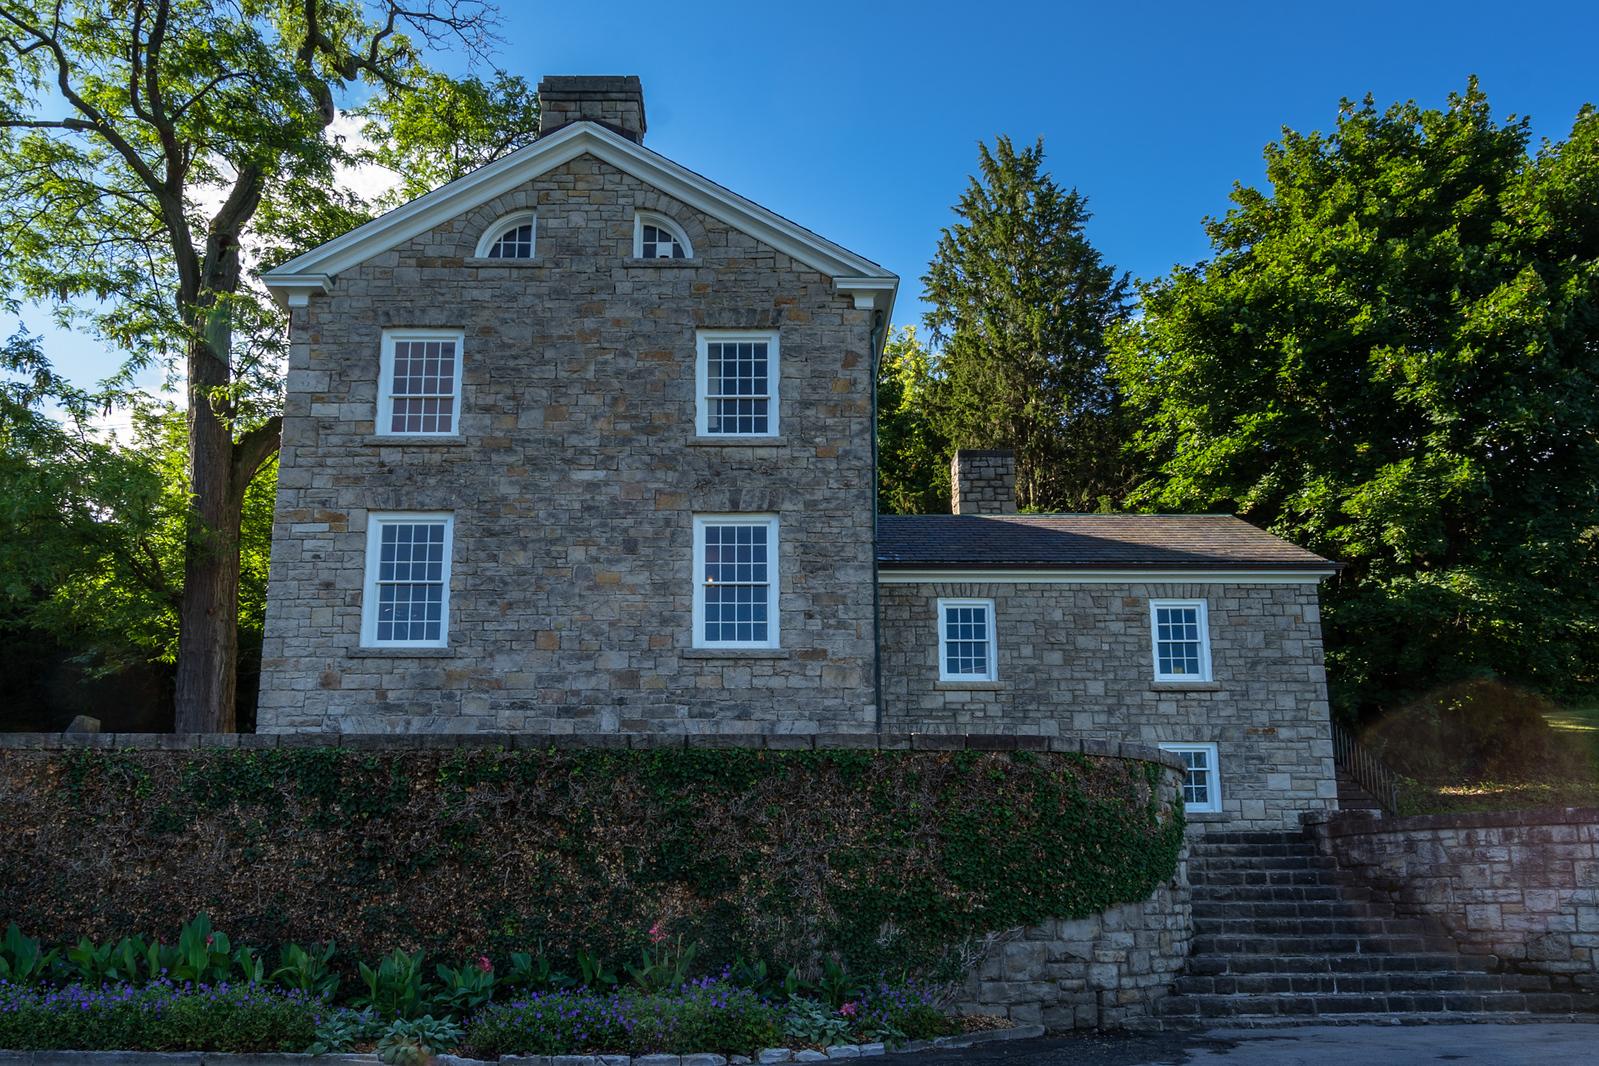 Niagara Falls Road Trip stop #7: The Mackenzie Printery & Newspaper Museum